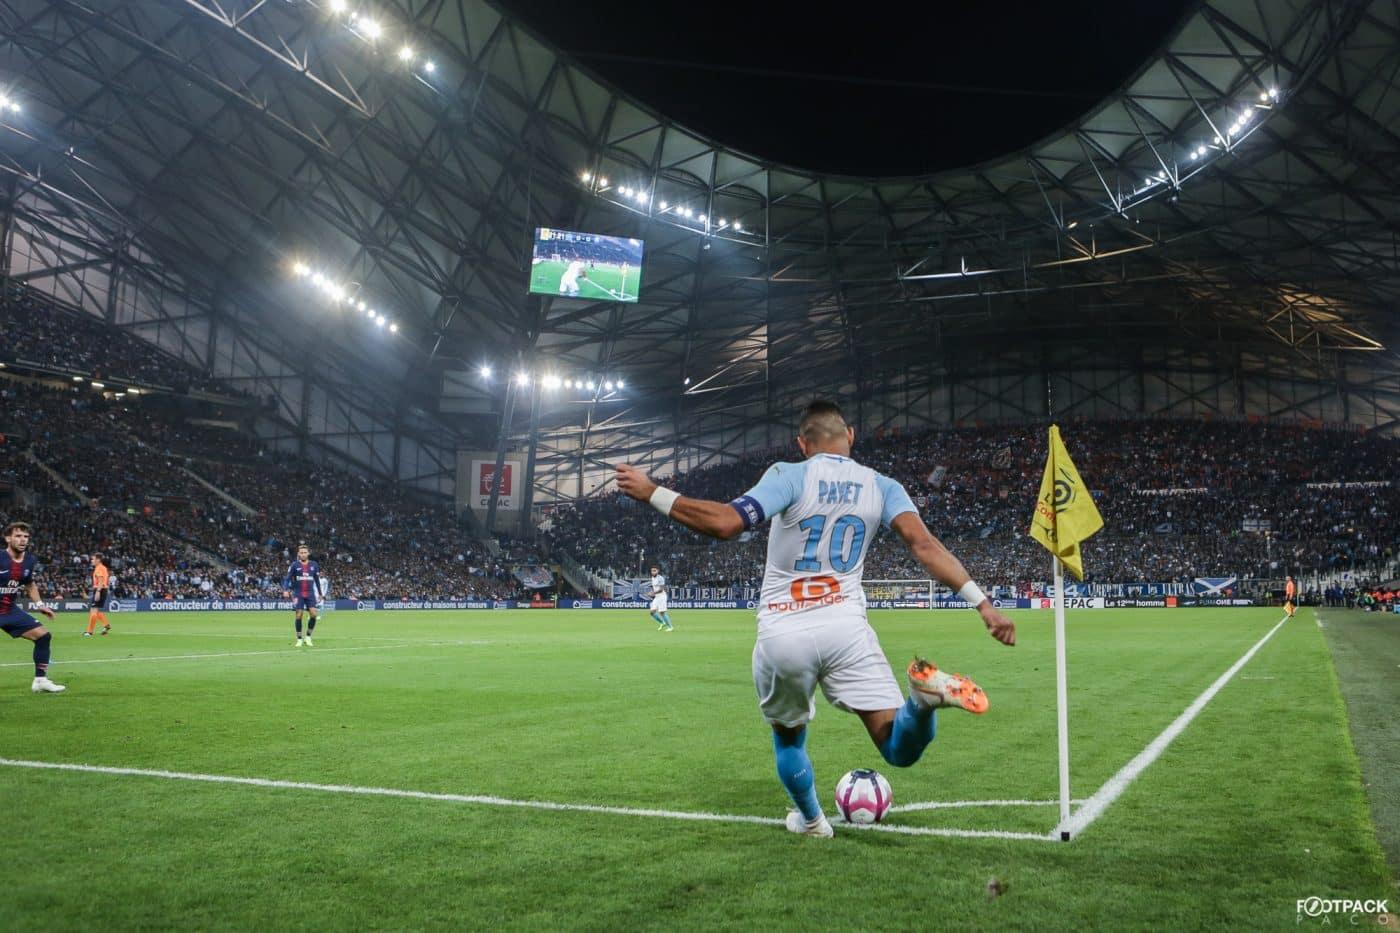 au-stade-marseille-paris-om-psg-footpack-21